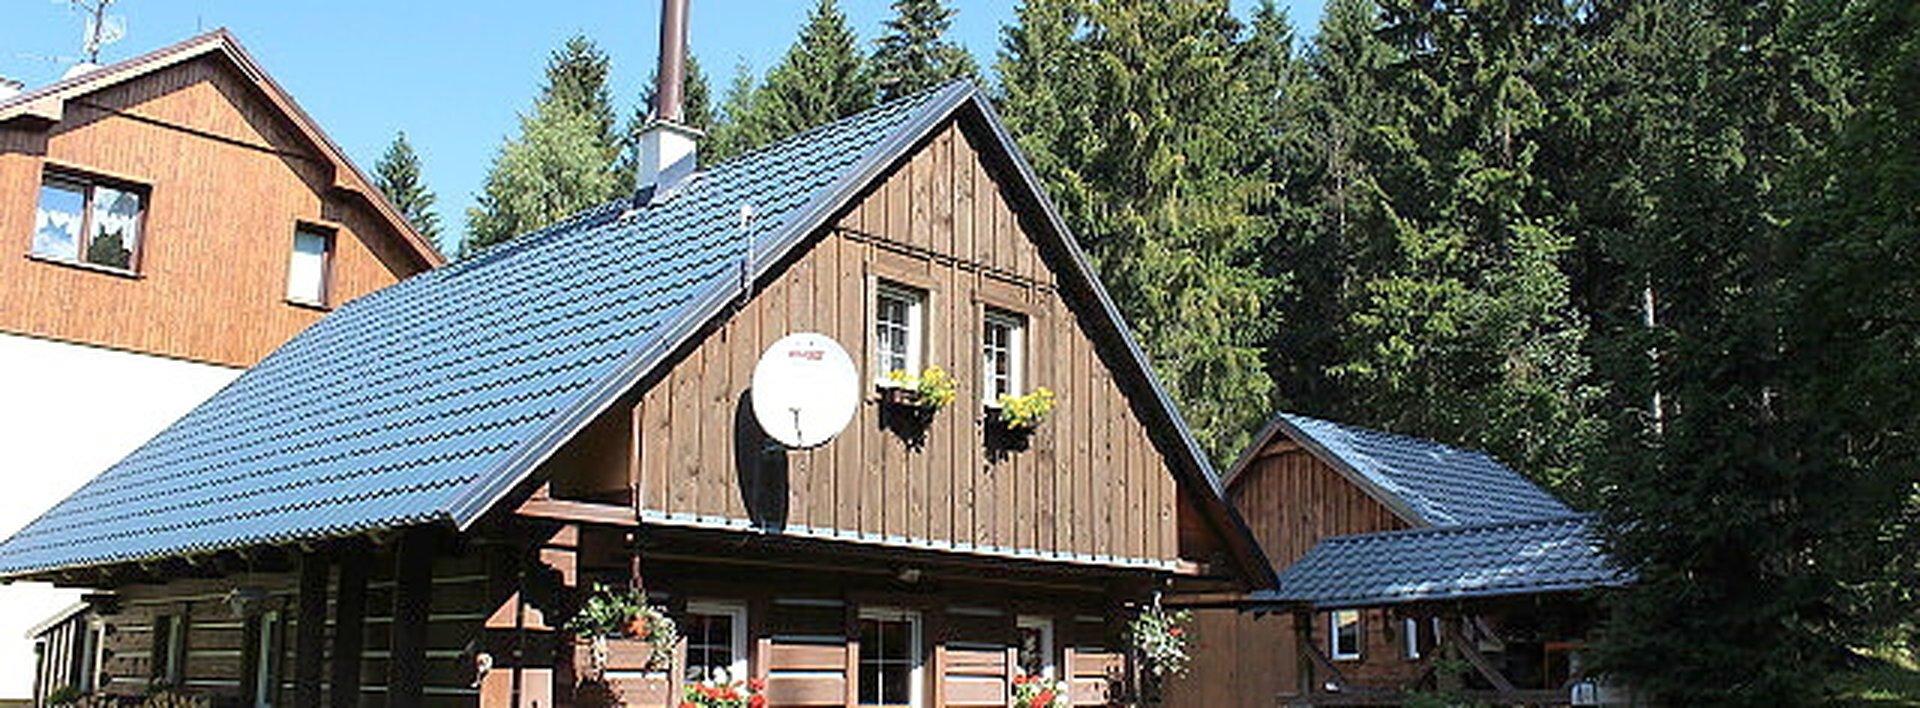 Prodej roubené dřevěnky, Harrachov, Krkonoše., Ev.č.: N46825